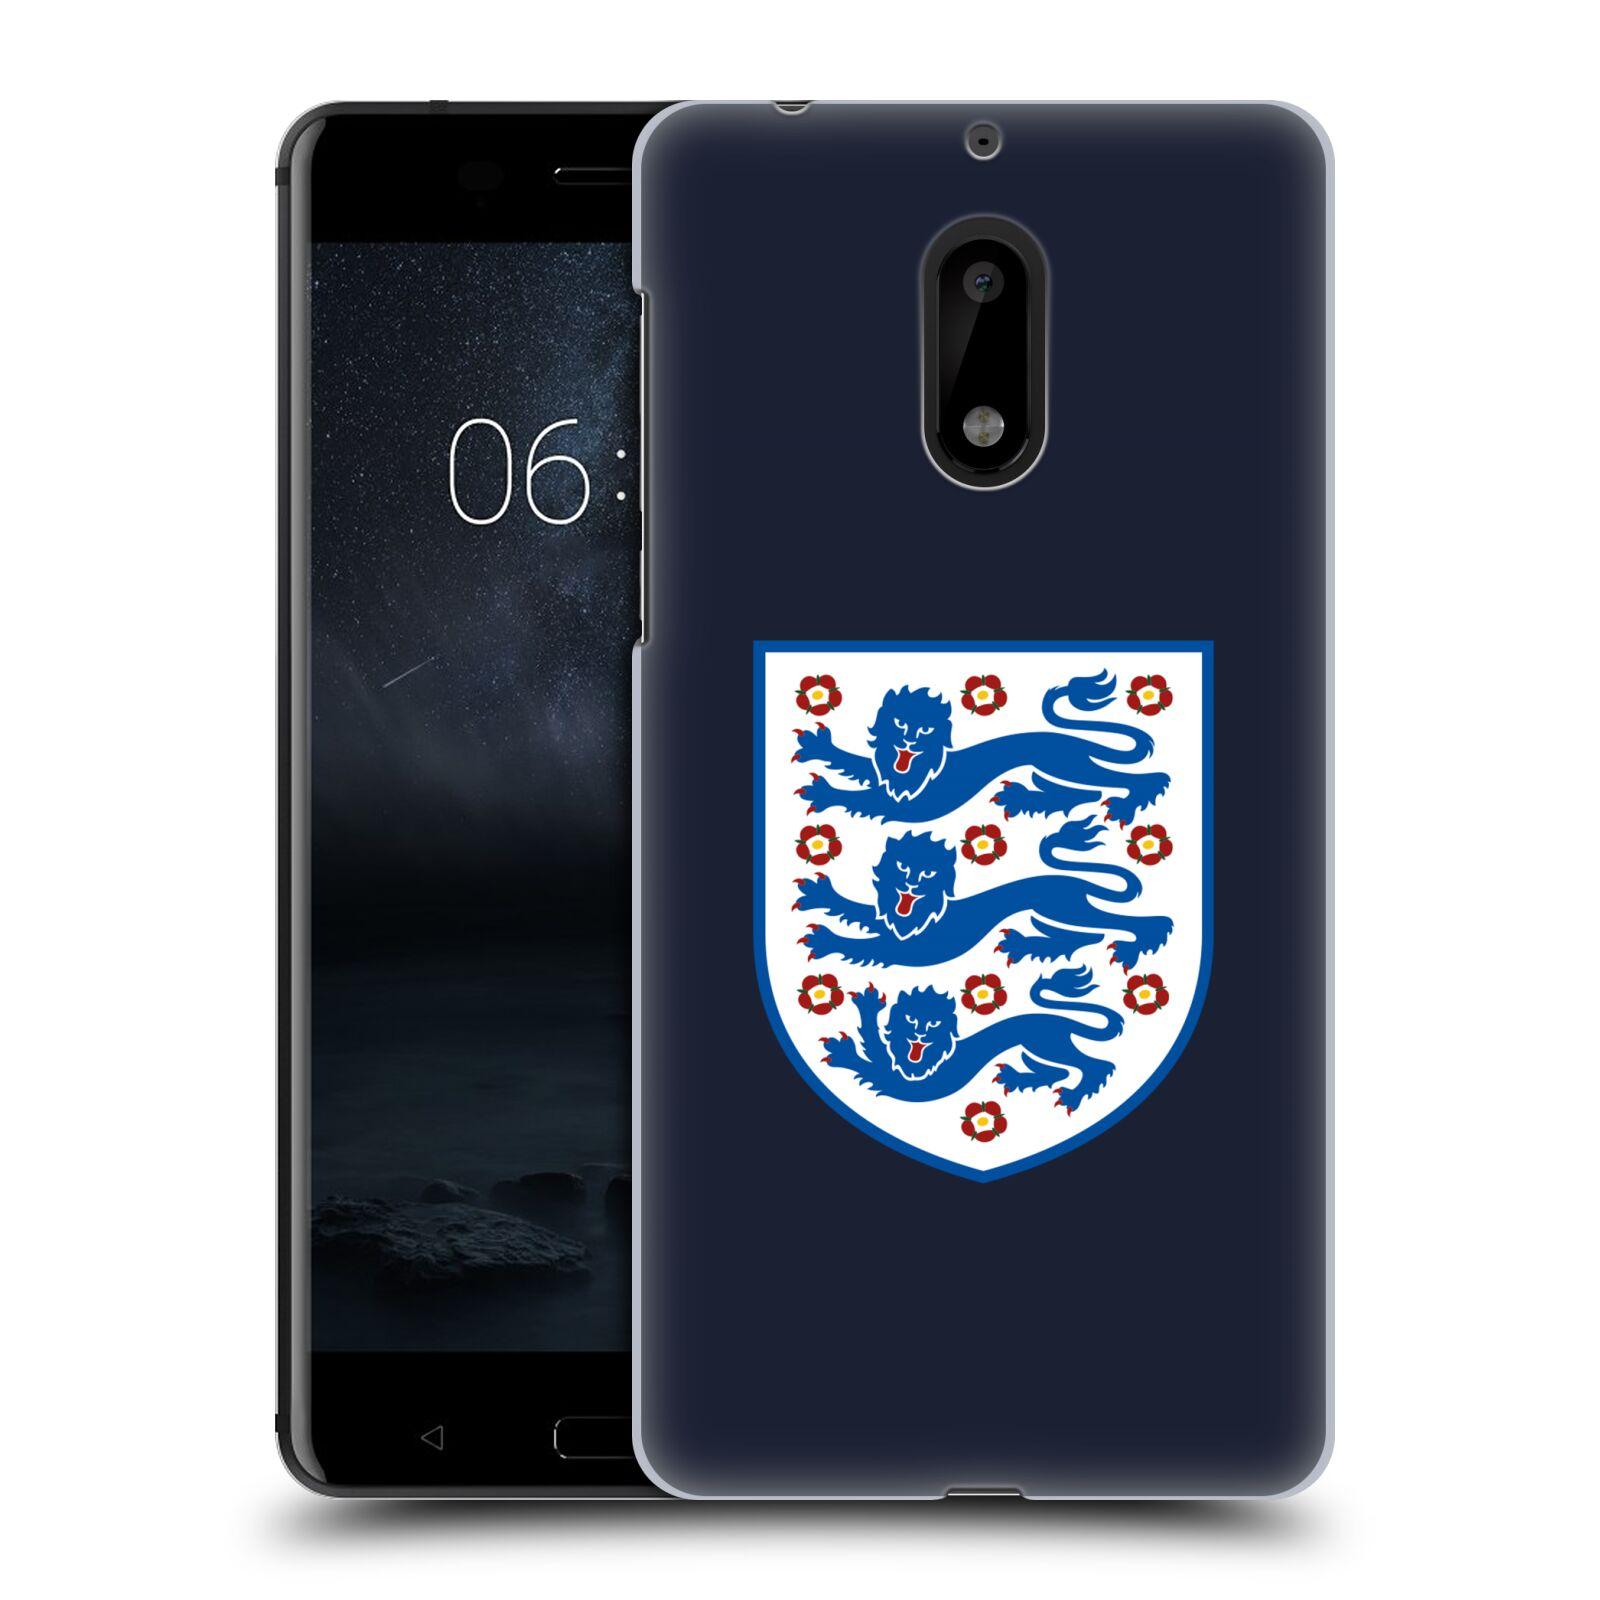 OFFICIAL-ENGLAND-FOOTBALL-TEAM-2018-CREST-HARD-BACK-CASE-FOR-NOKIA-PHONES-1